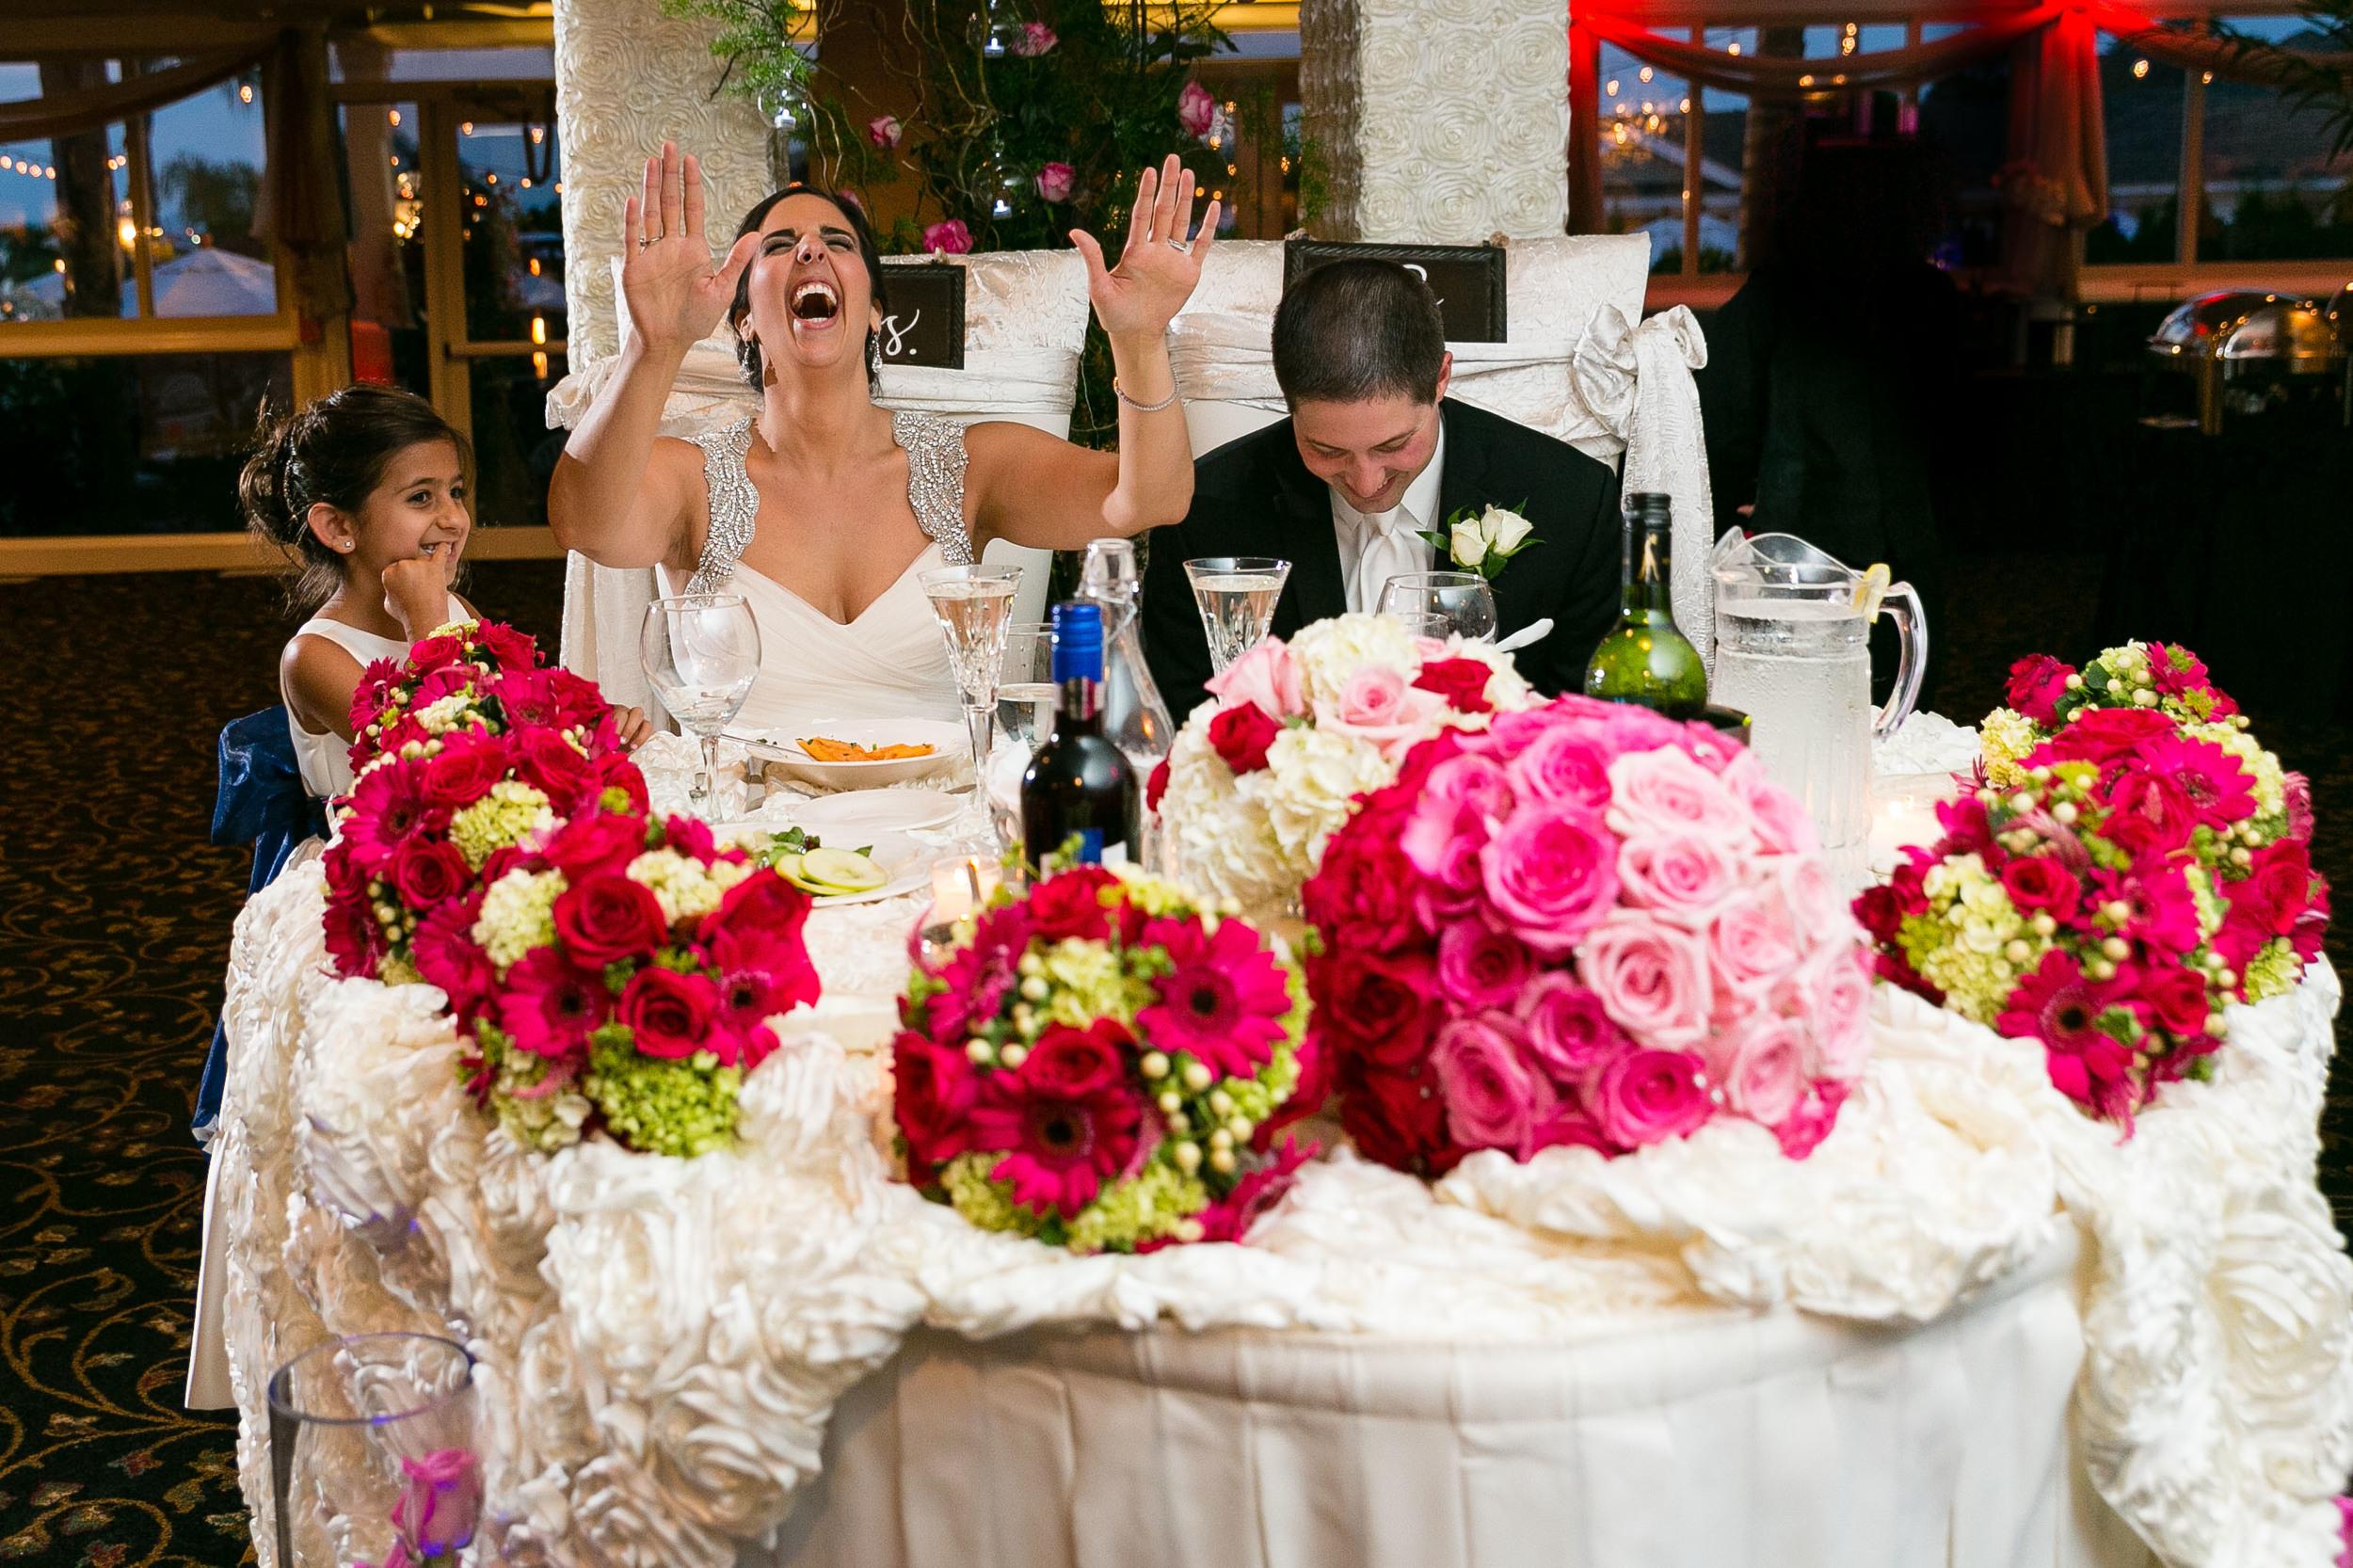 Summer-American-Wedding-Anthonys-Ocean-View-New-Haven-Documentary-Wedding-Photographer-Jacek-Dolata-22.jpg